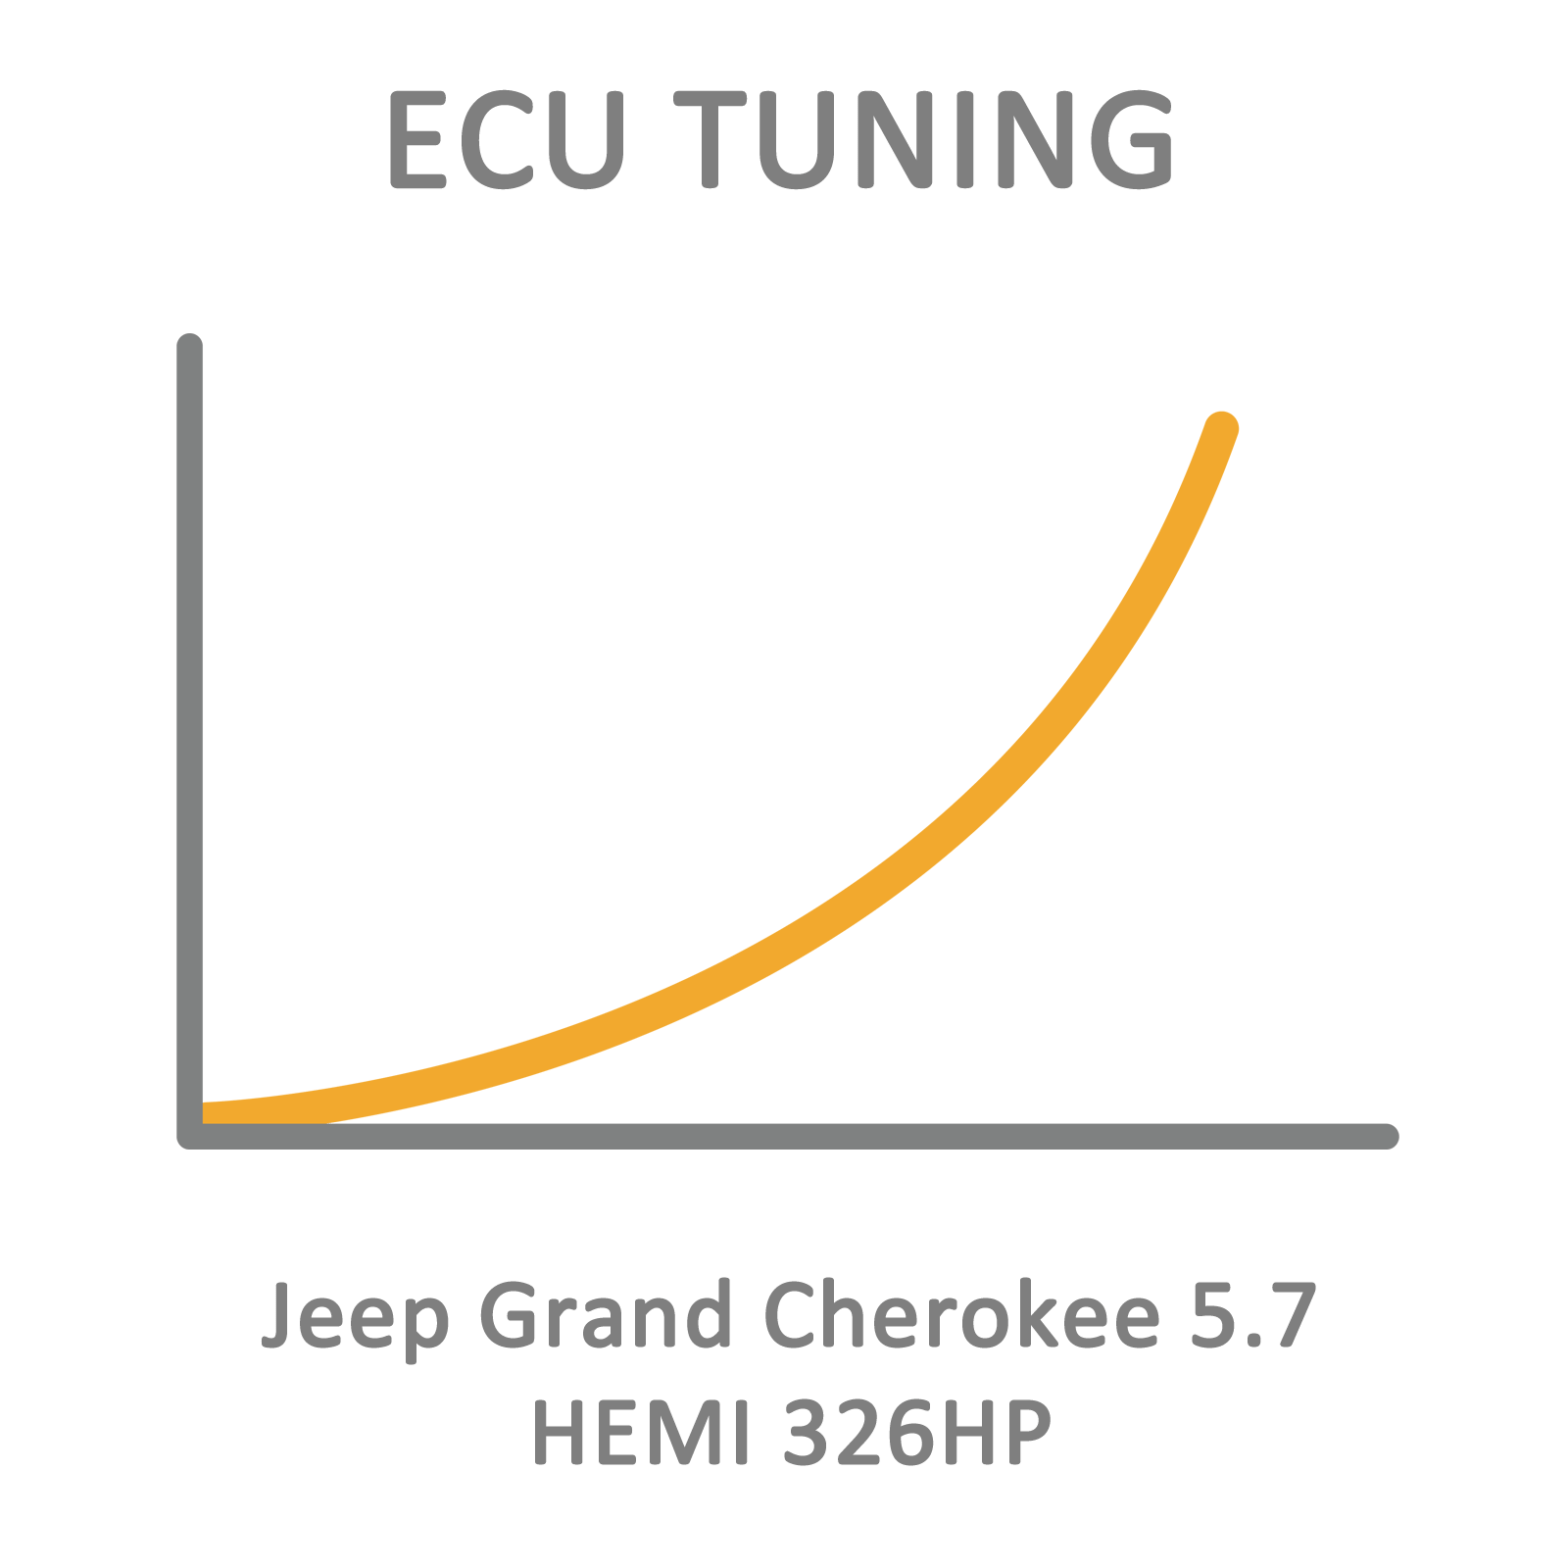 Jeep Grand Cherokee 5.7 HEMI 326HP ECU Tuning Remapping